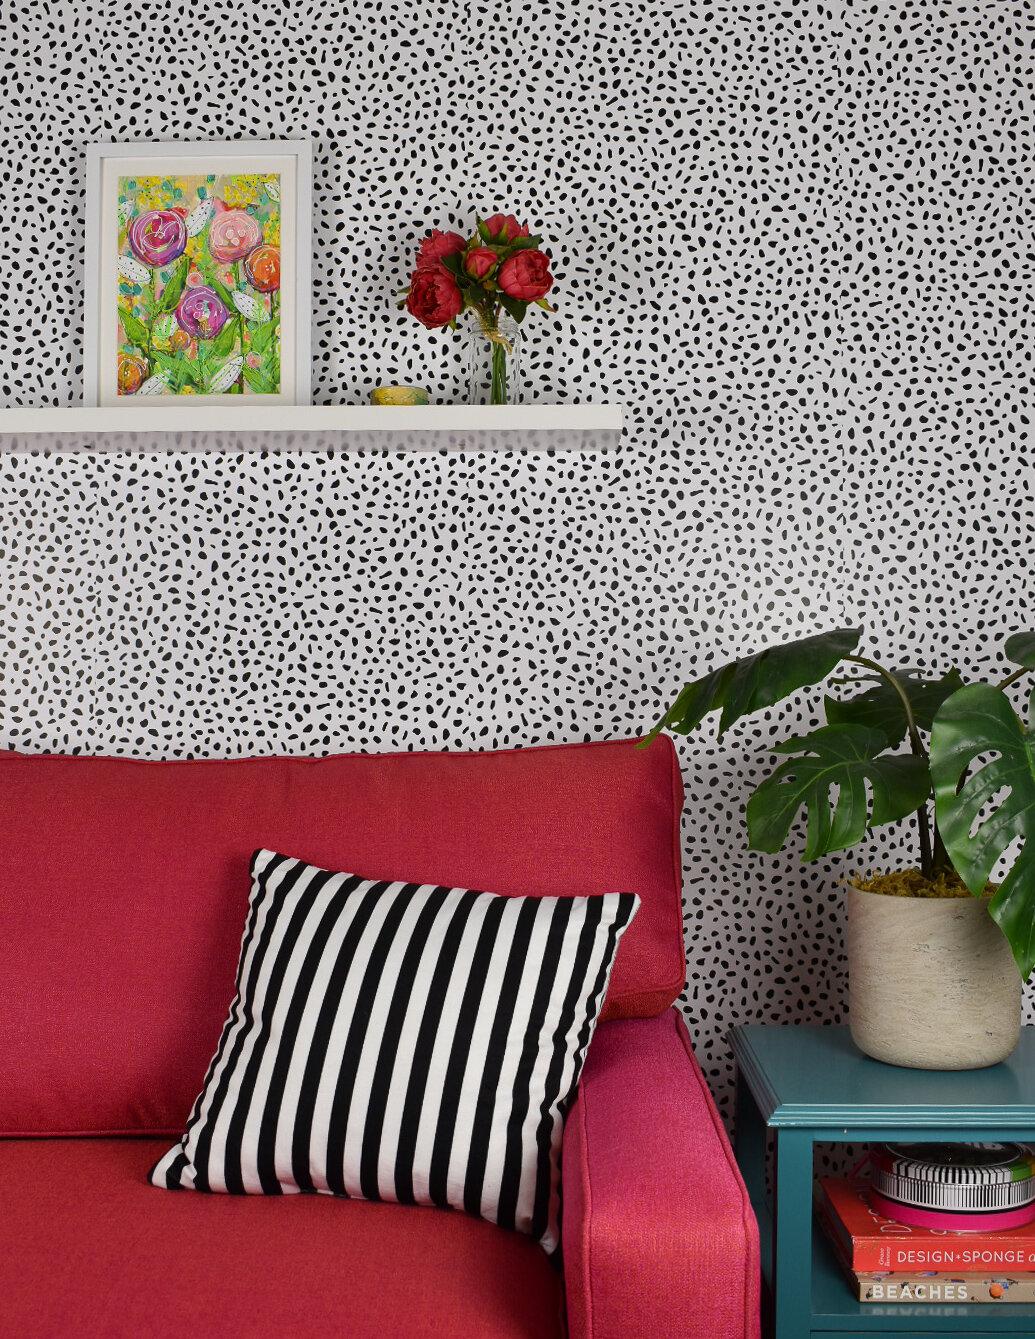 abstract_boho_flowers_painting_daisyfaithart_3.jpg